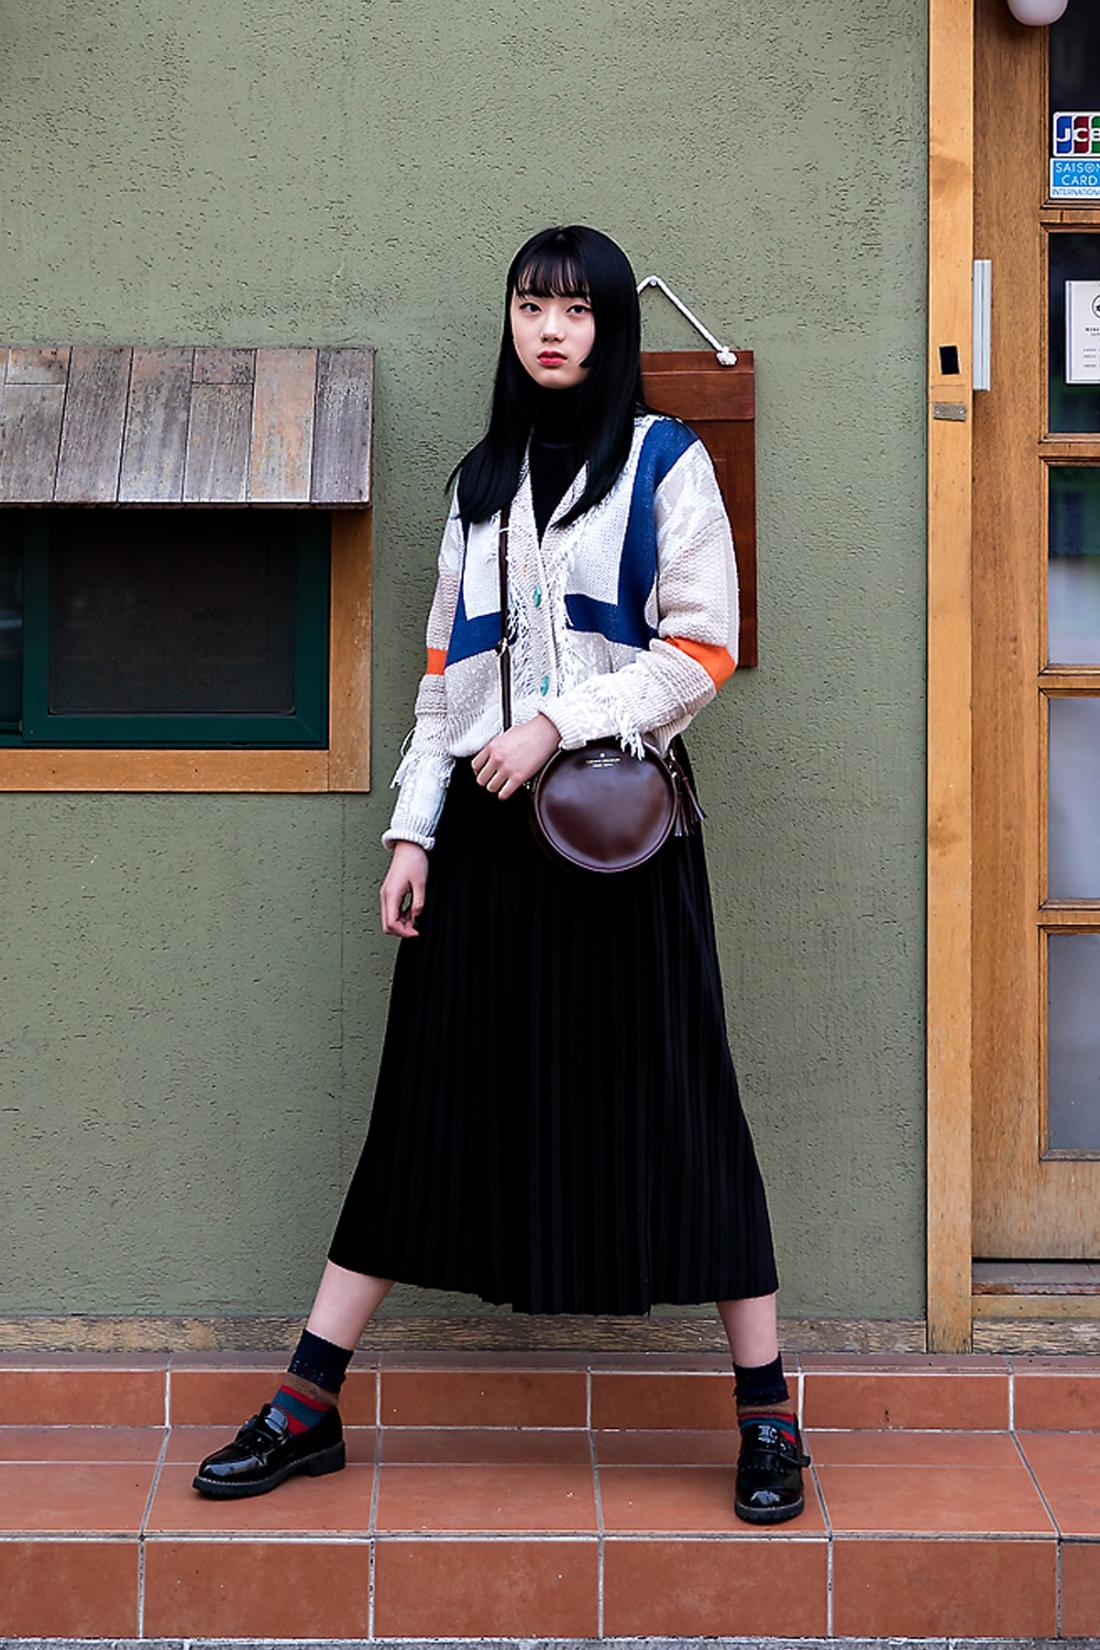 Jung Jiin, Street Fashion 2017 in SEOUL.jpg